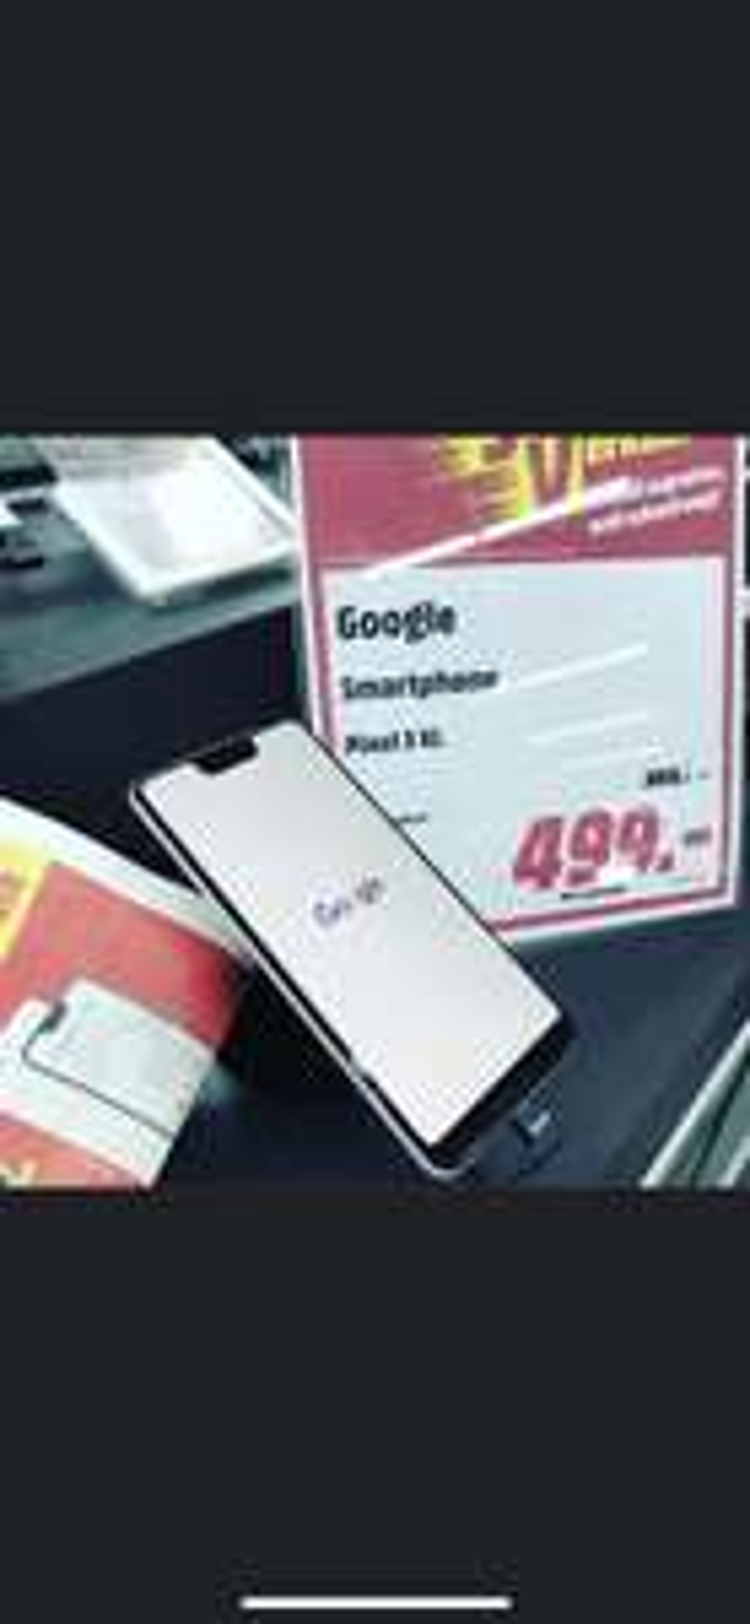 Lokal Mediamarkt Emmendingen Google Pixel 3 XL